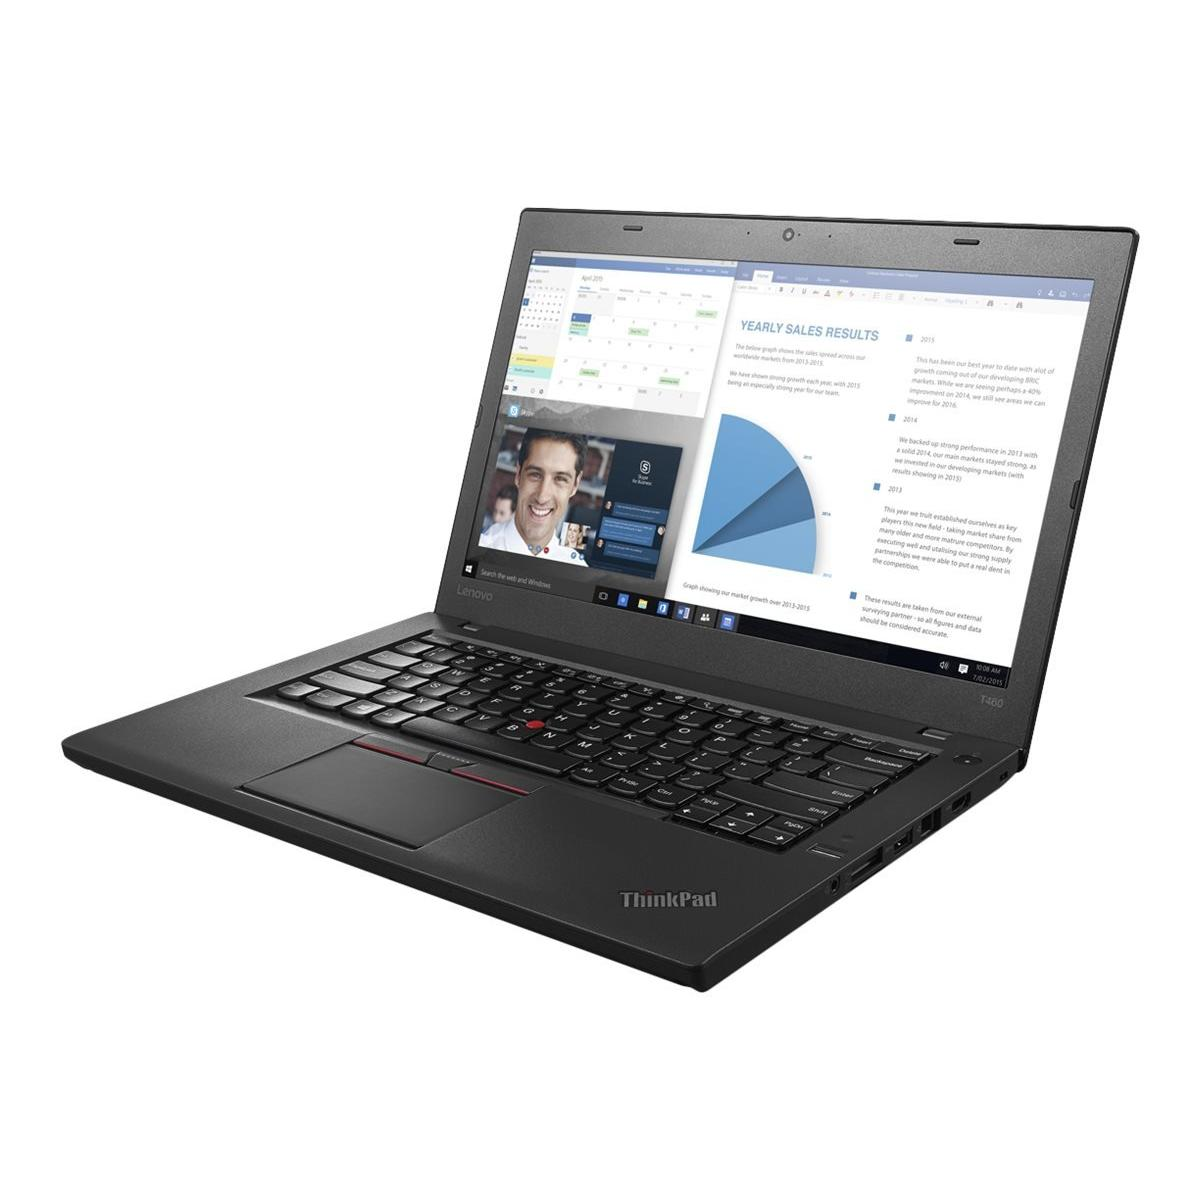 Lenovo Thinkpad T460 14-inch (2017) - Core i5-520M - 4 GB  - HDD 320 GB